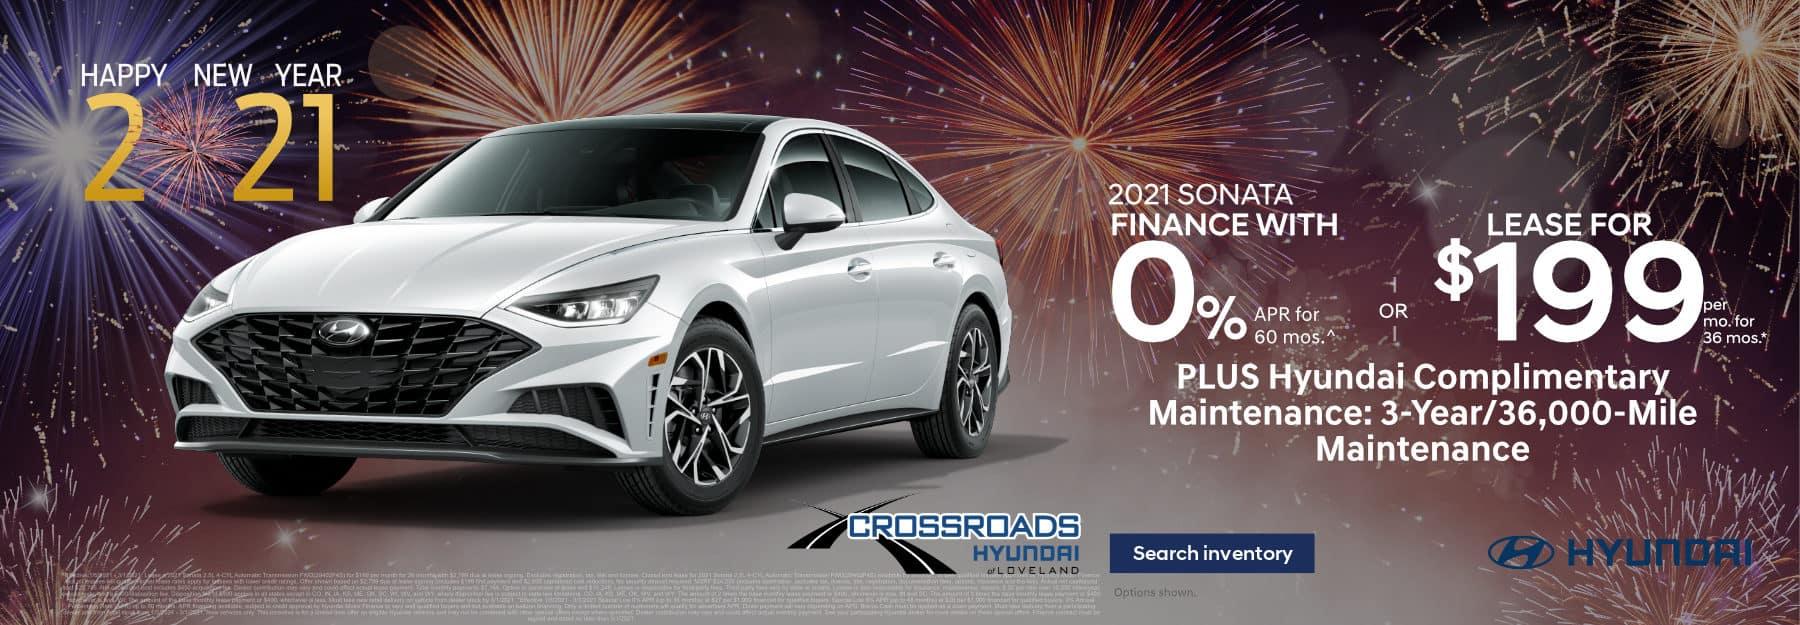 January_2021_SONATA_CROSSROADS_Hyundai